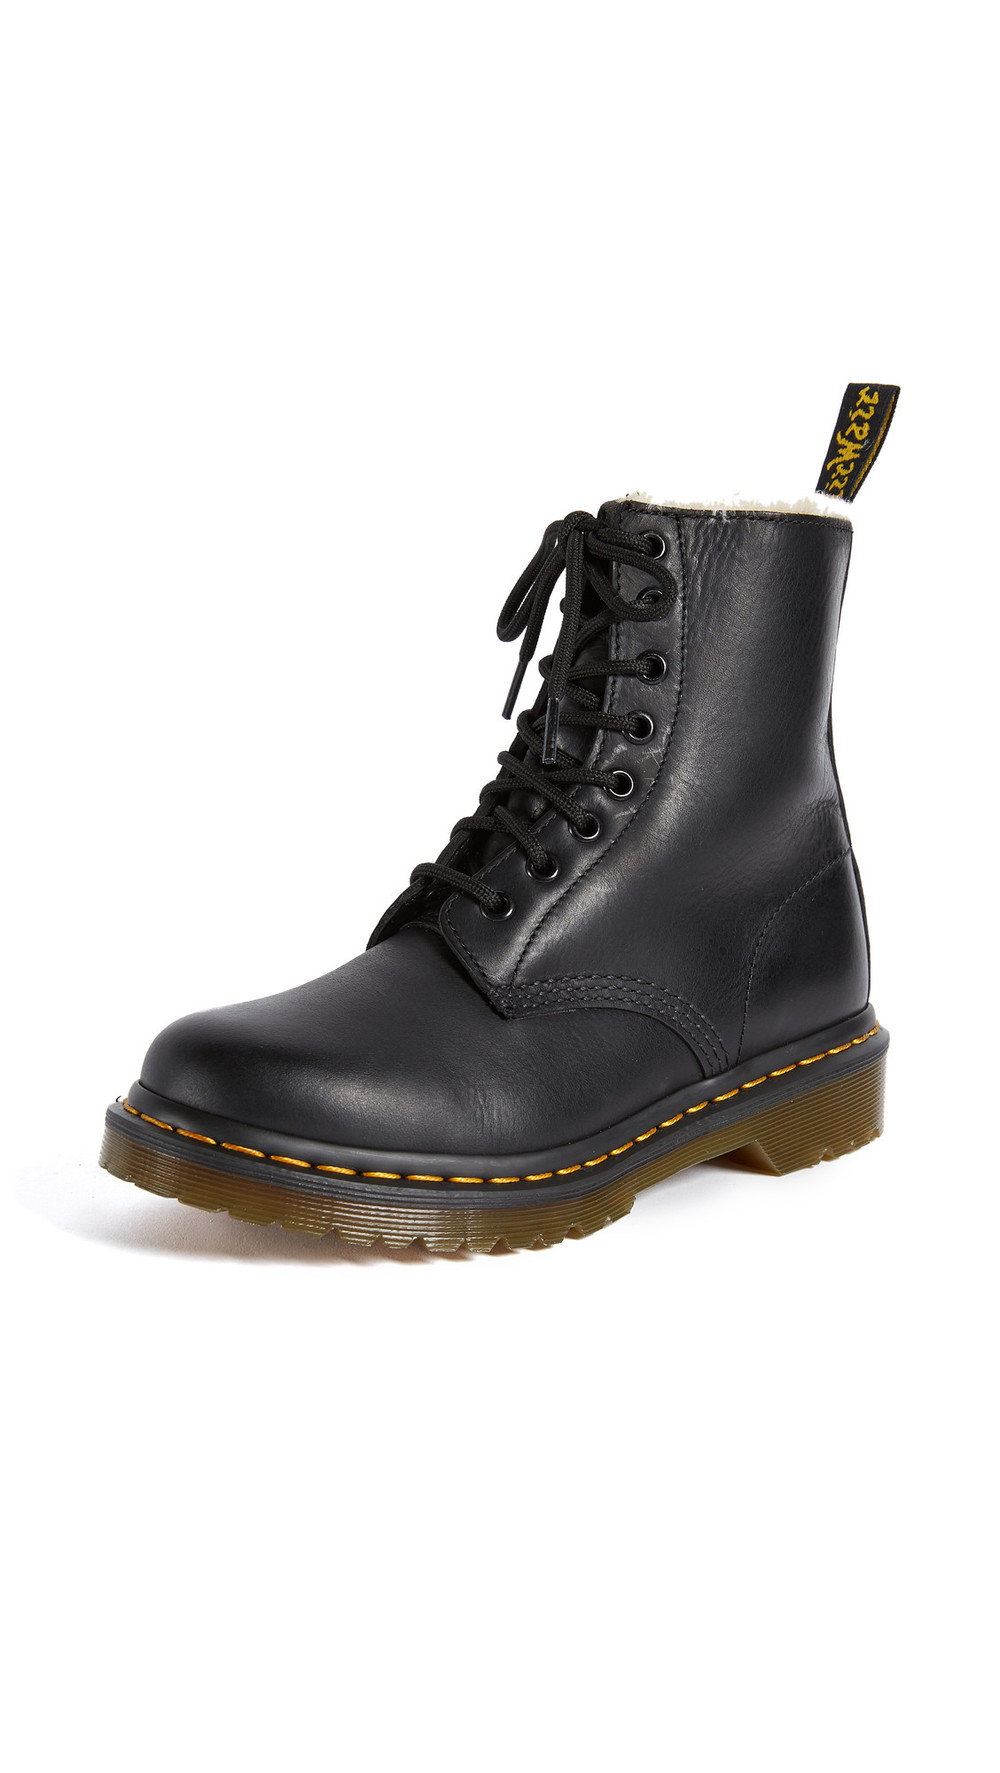 Dr. Martens 1460 Serena 8 Eye Sherpa Boots in black